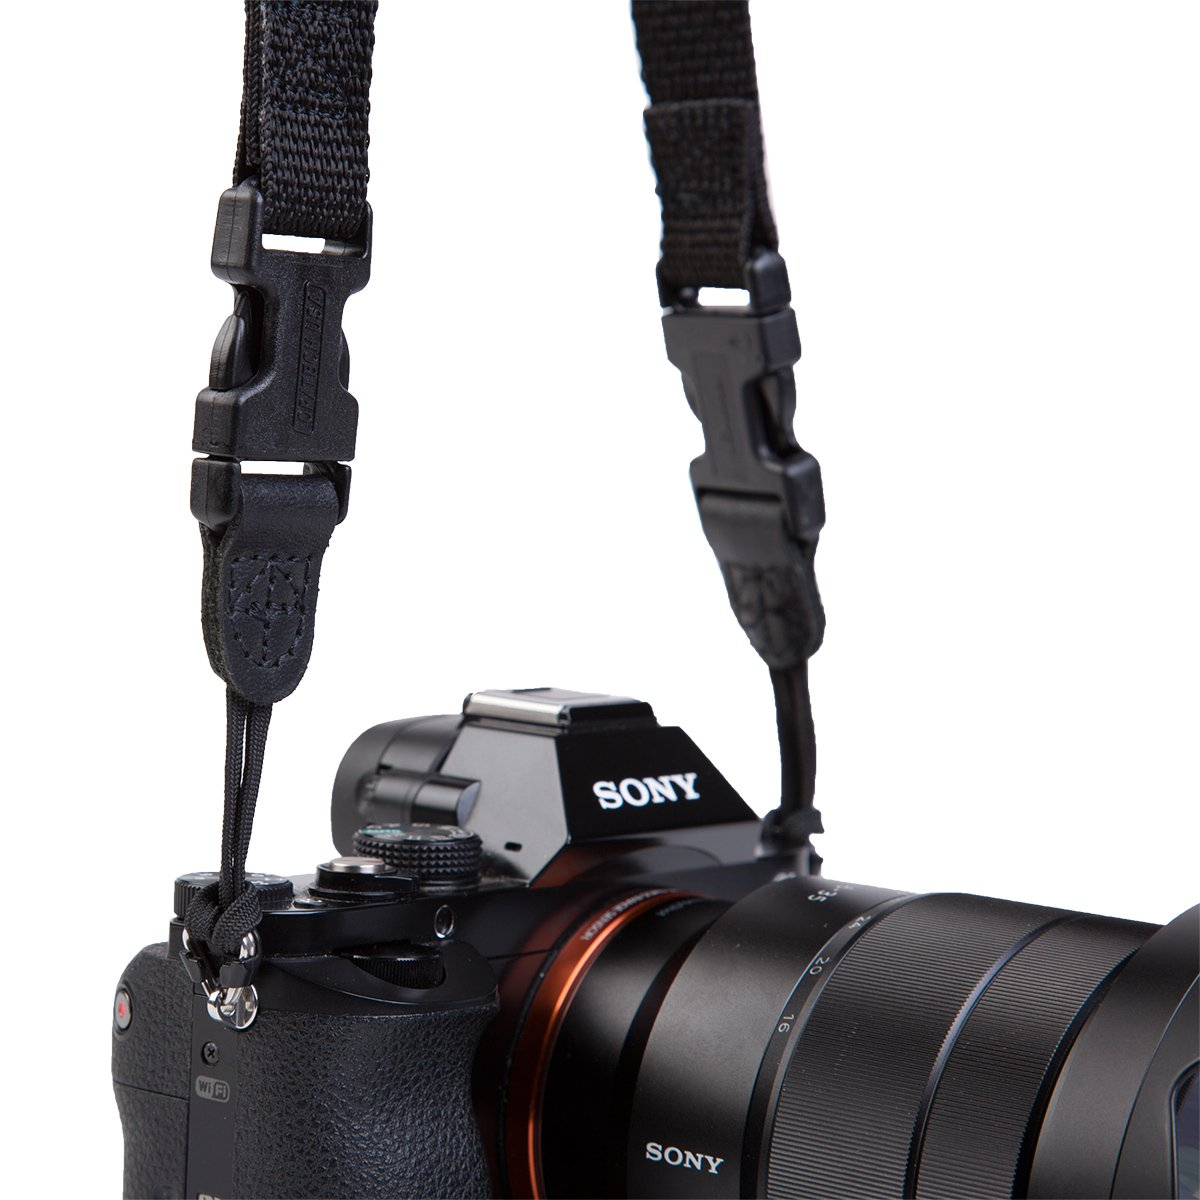 Black OP//TECH USA 1001062 Super Classic Strap-Uni Loop for Cameras and Binoculars-Neoprene